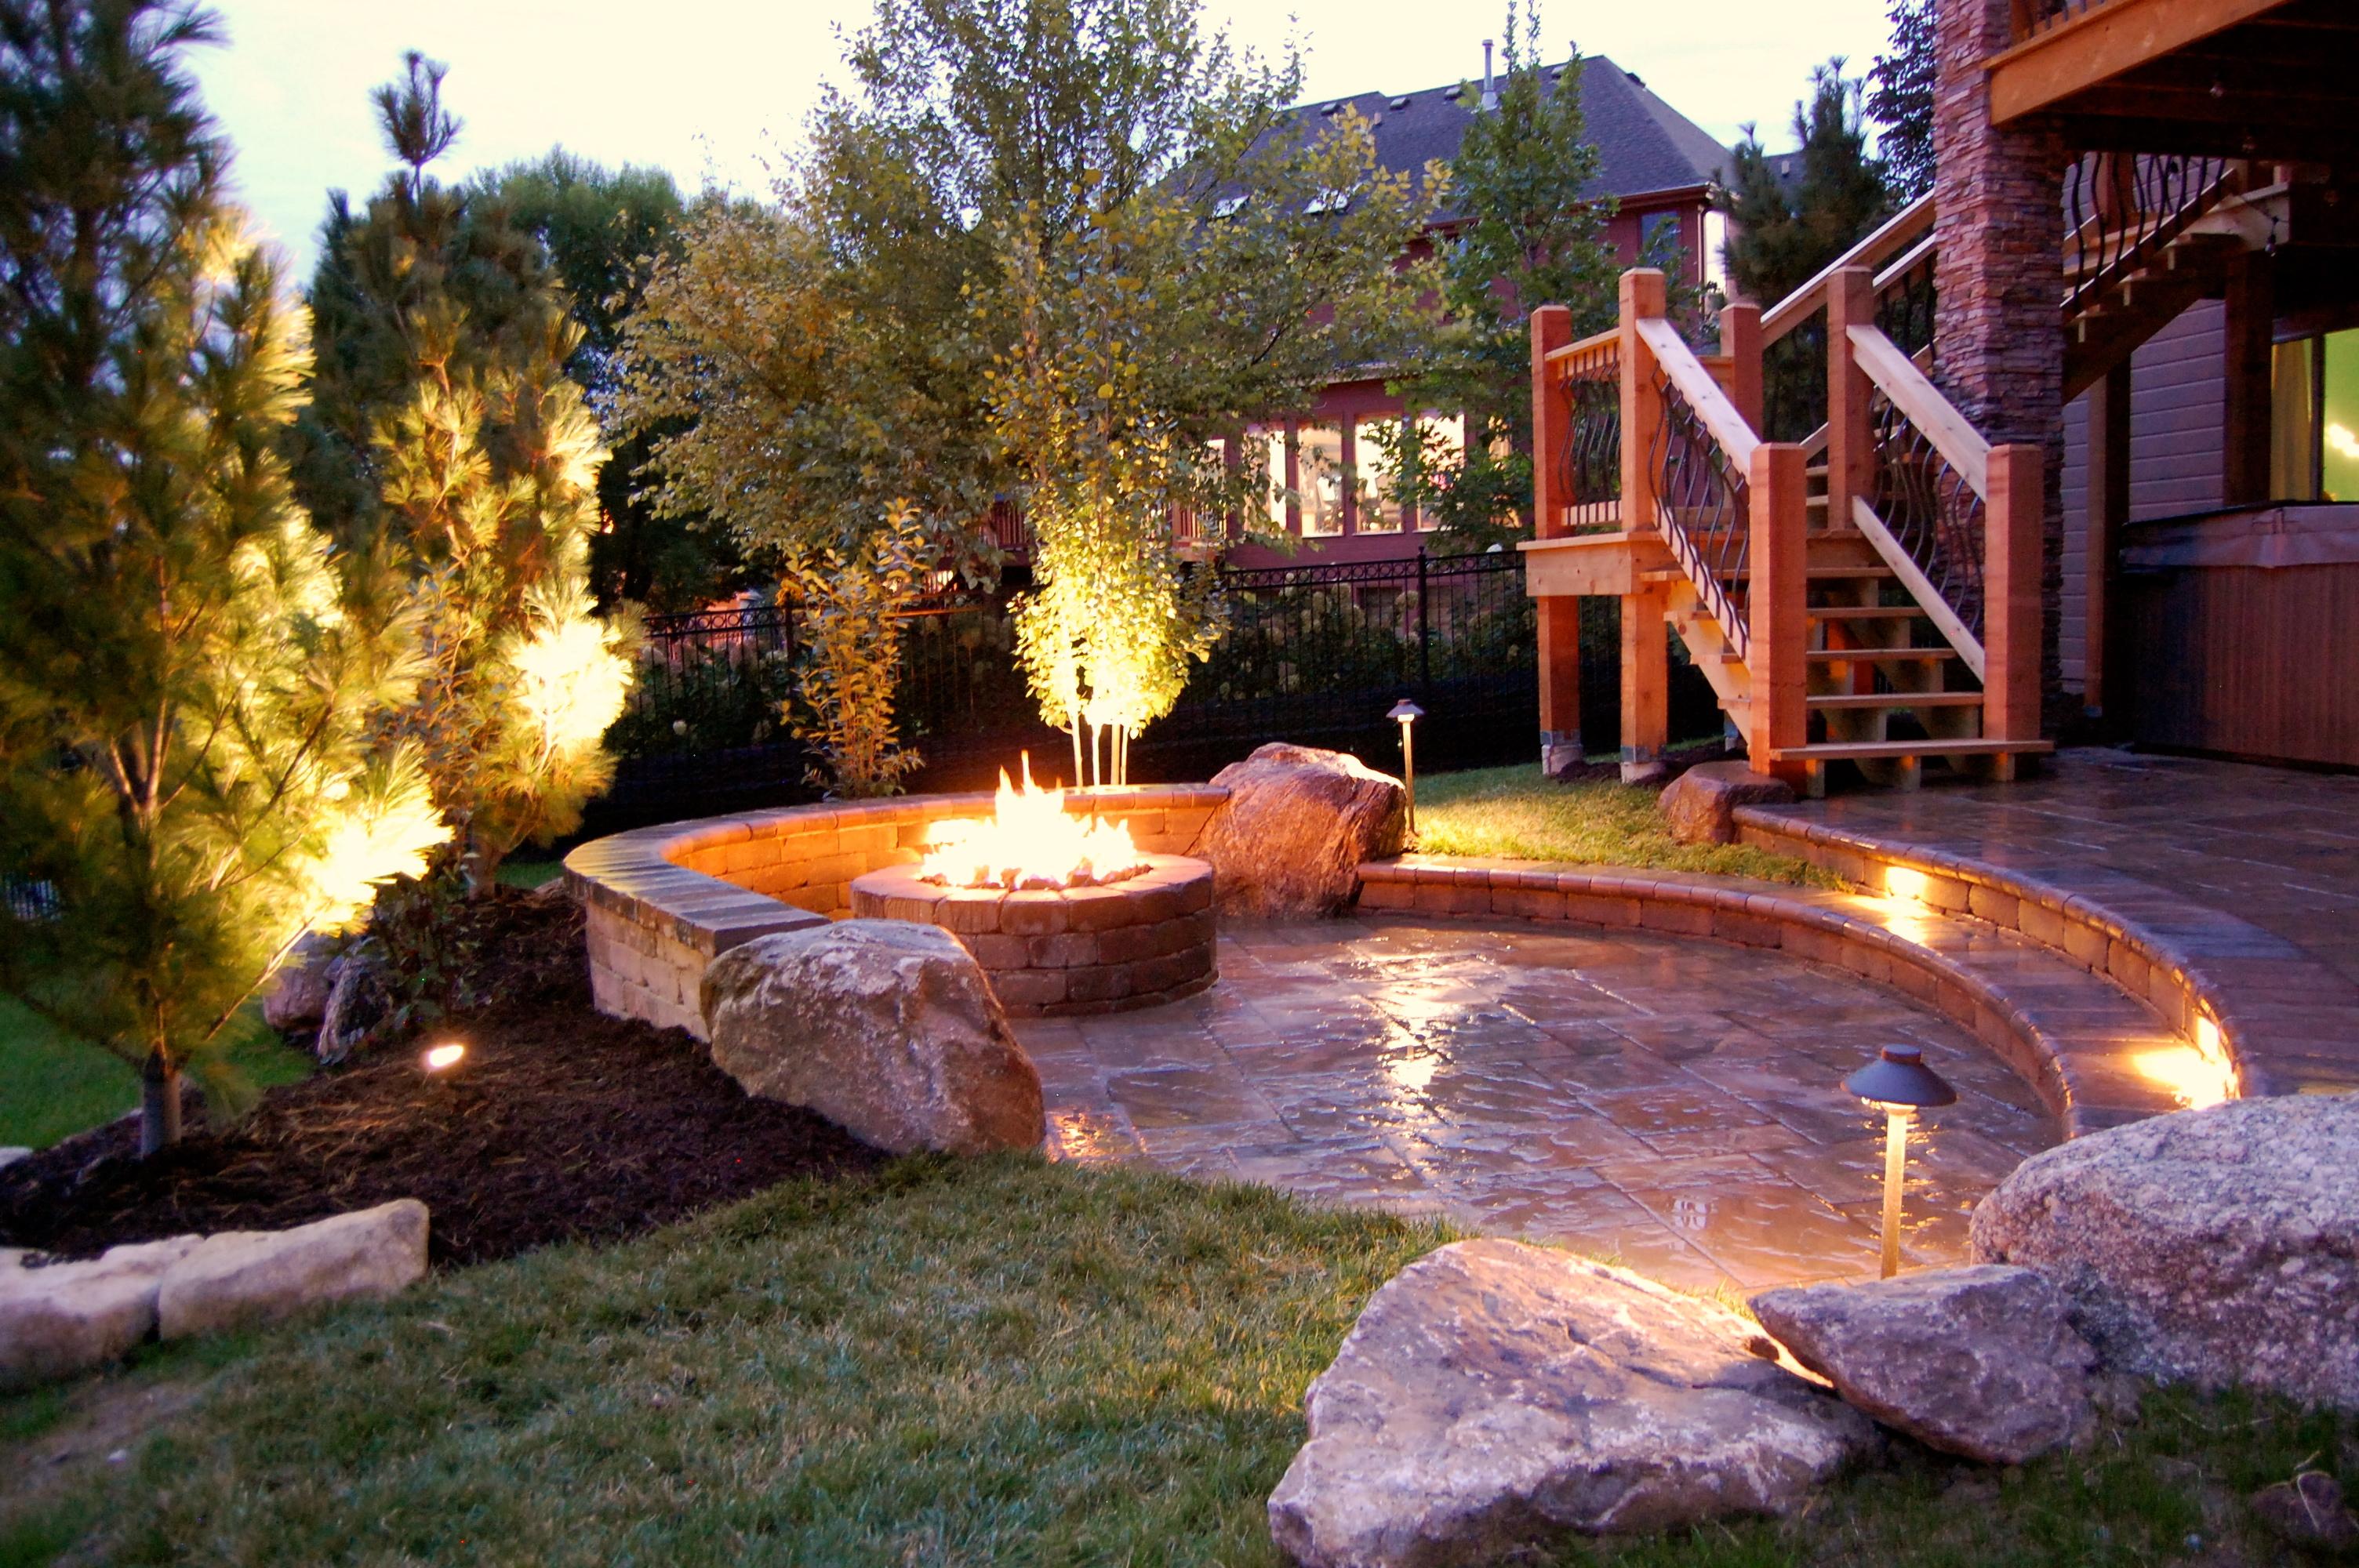 Paver patio, landscape lighting